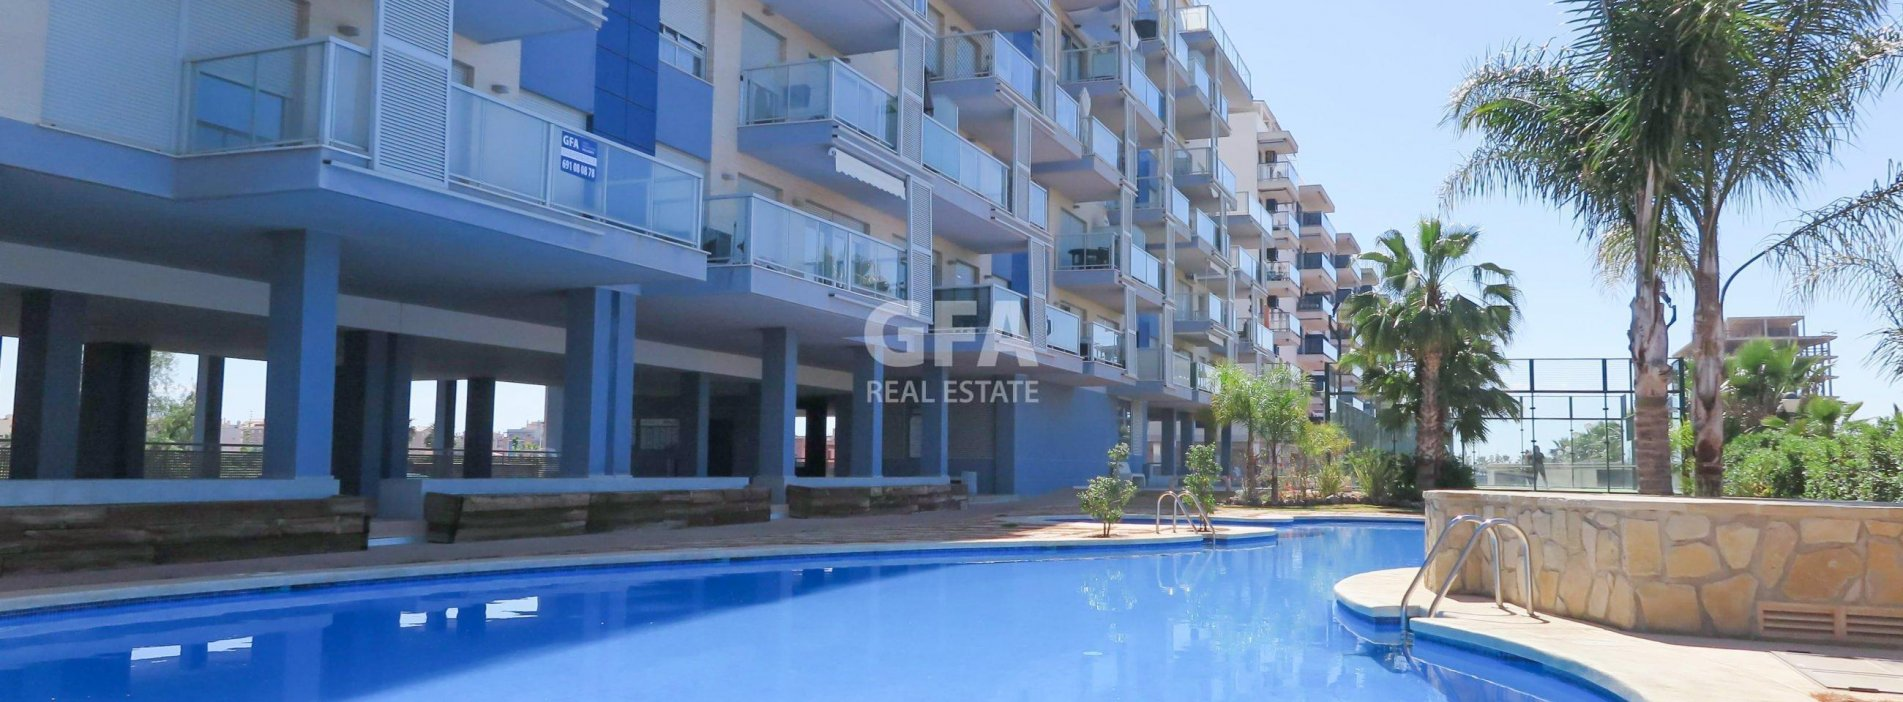 Residencial Veles Blanques de obra nueva en Moncófar piscina